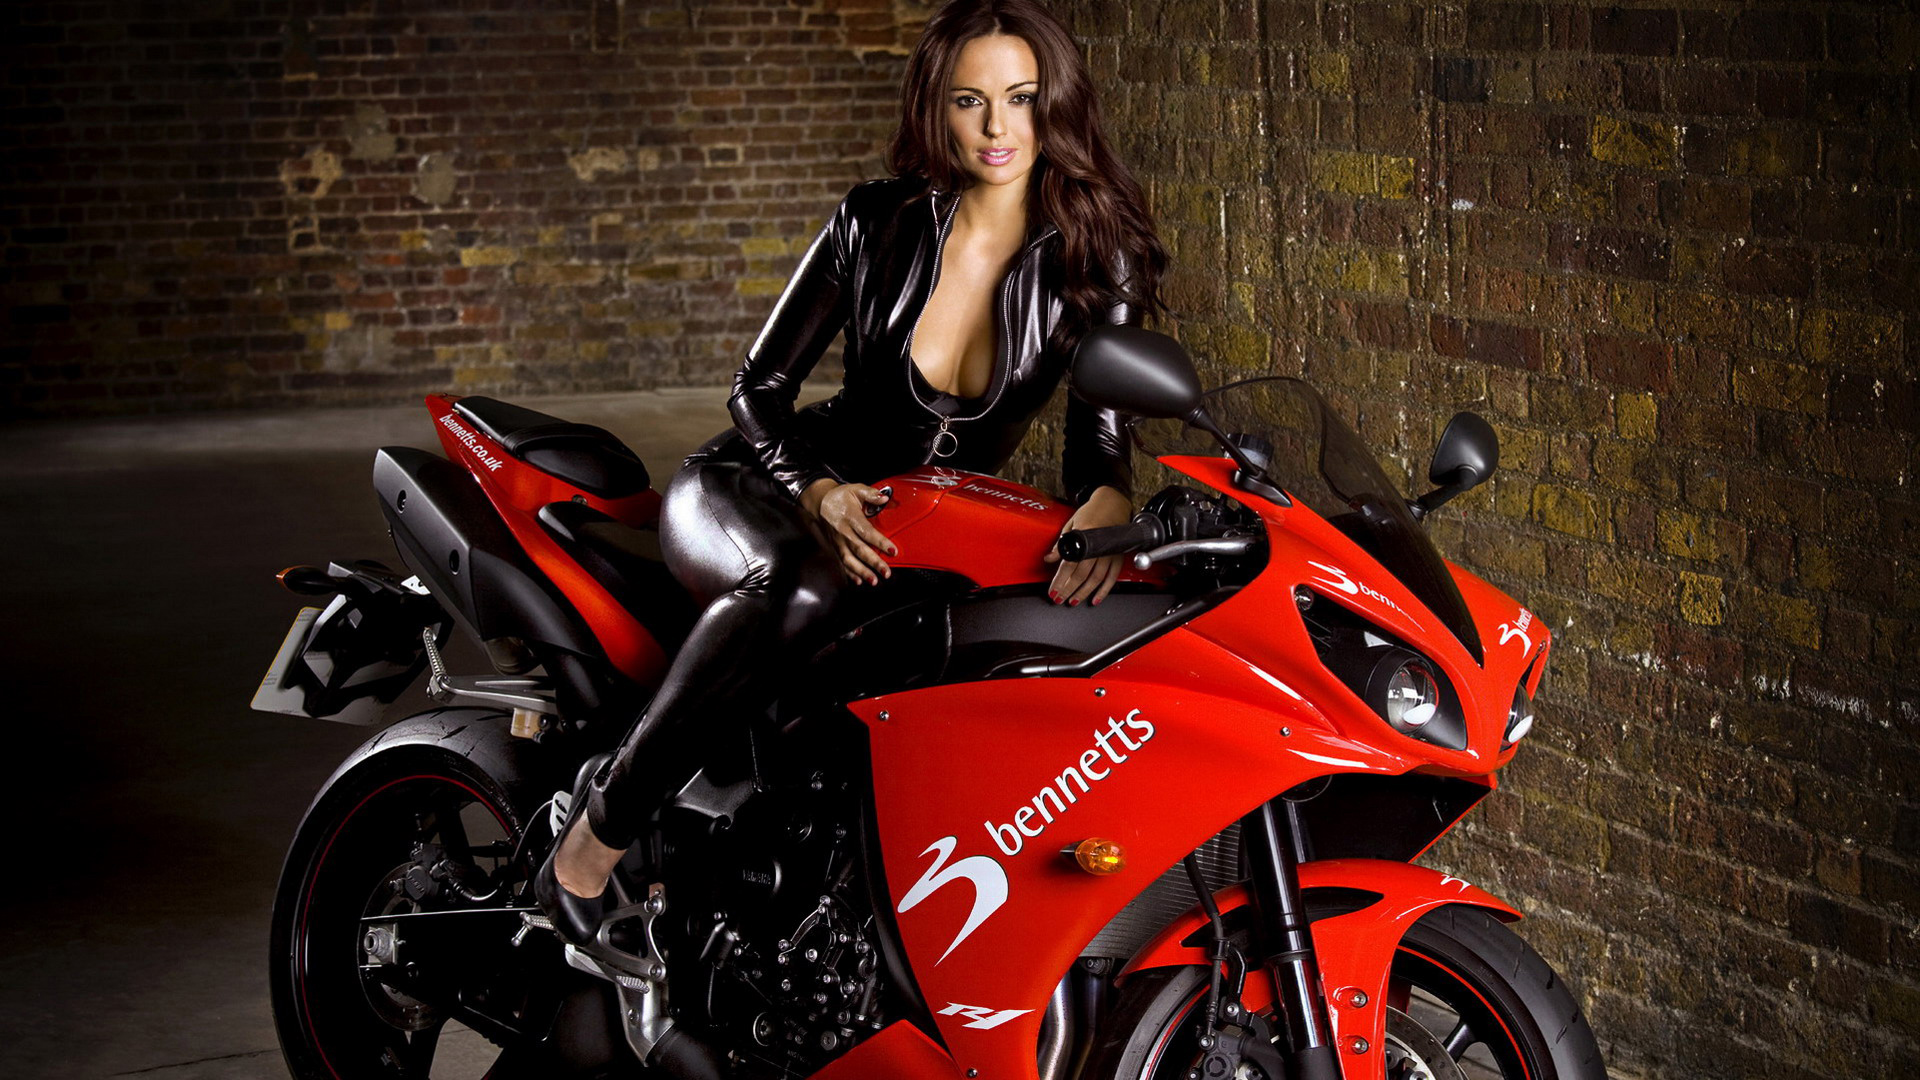 Motorcycles Hot Girl on Bike Wide Screen Wallpaper 1080p2K4K 1920x1080